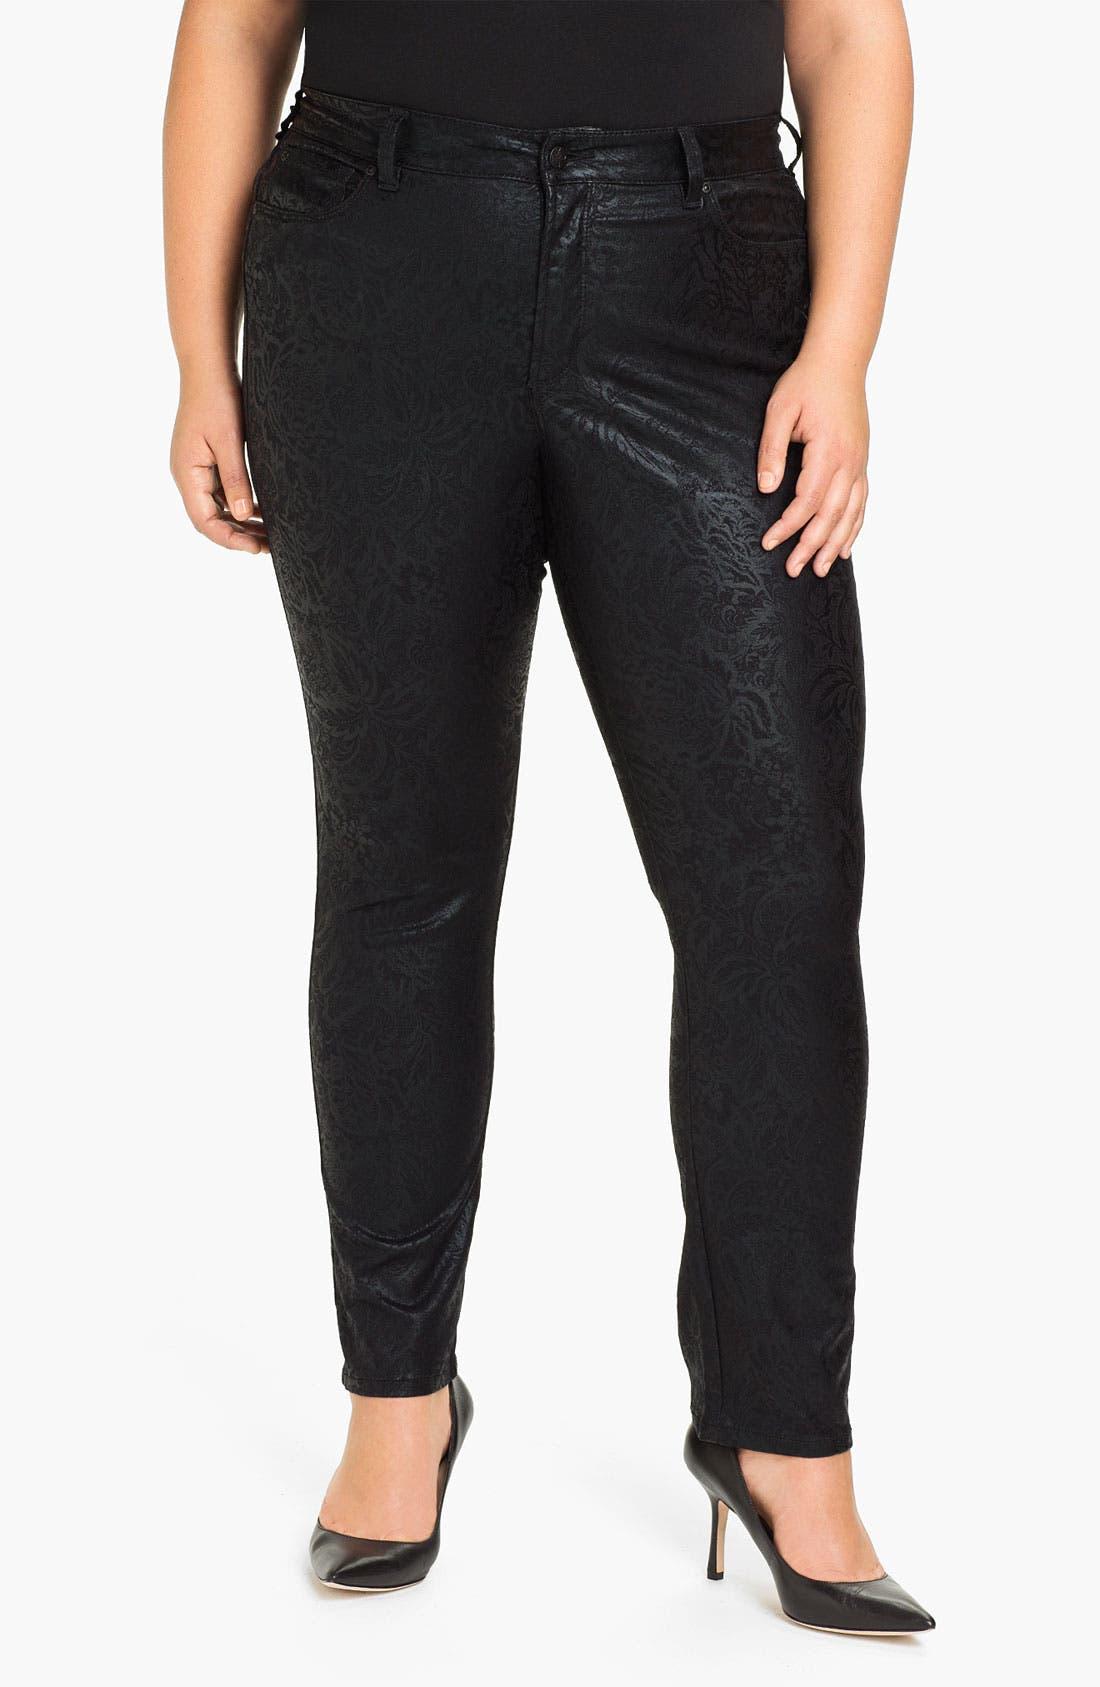 Main Image - NYDJ 'Sheri - Gilded Lily' Stretch Denim Jeans (Plus)